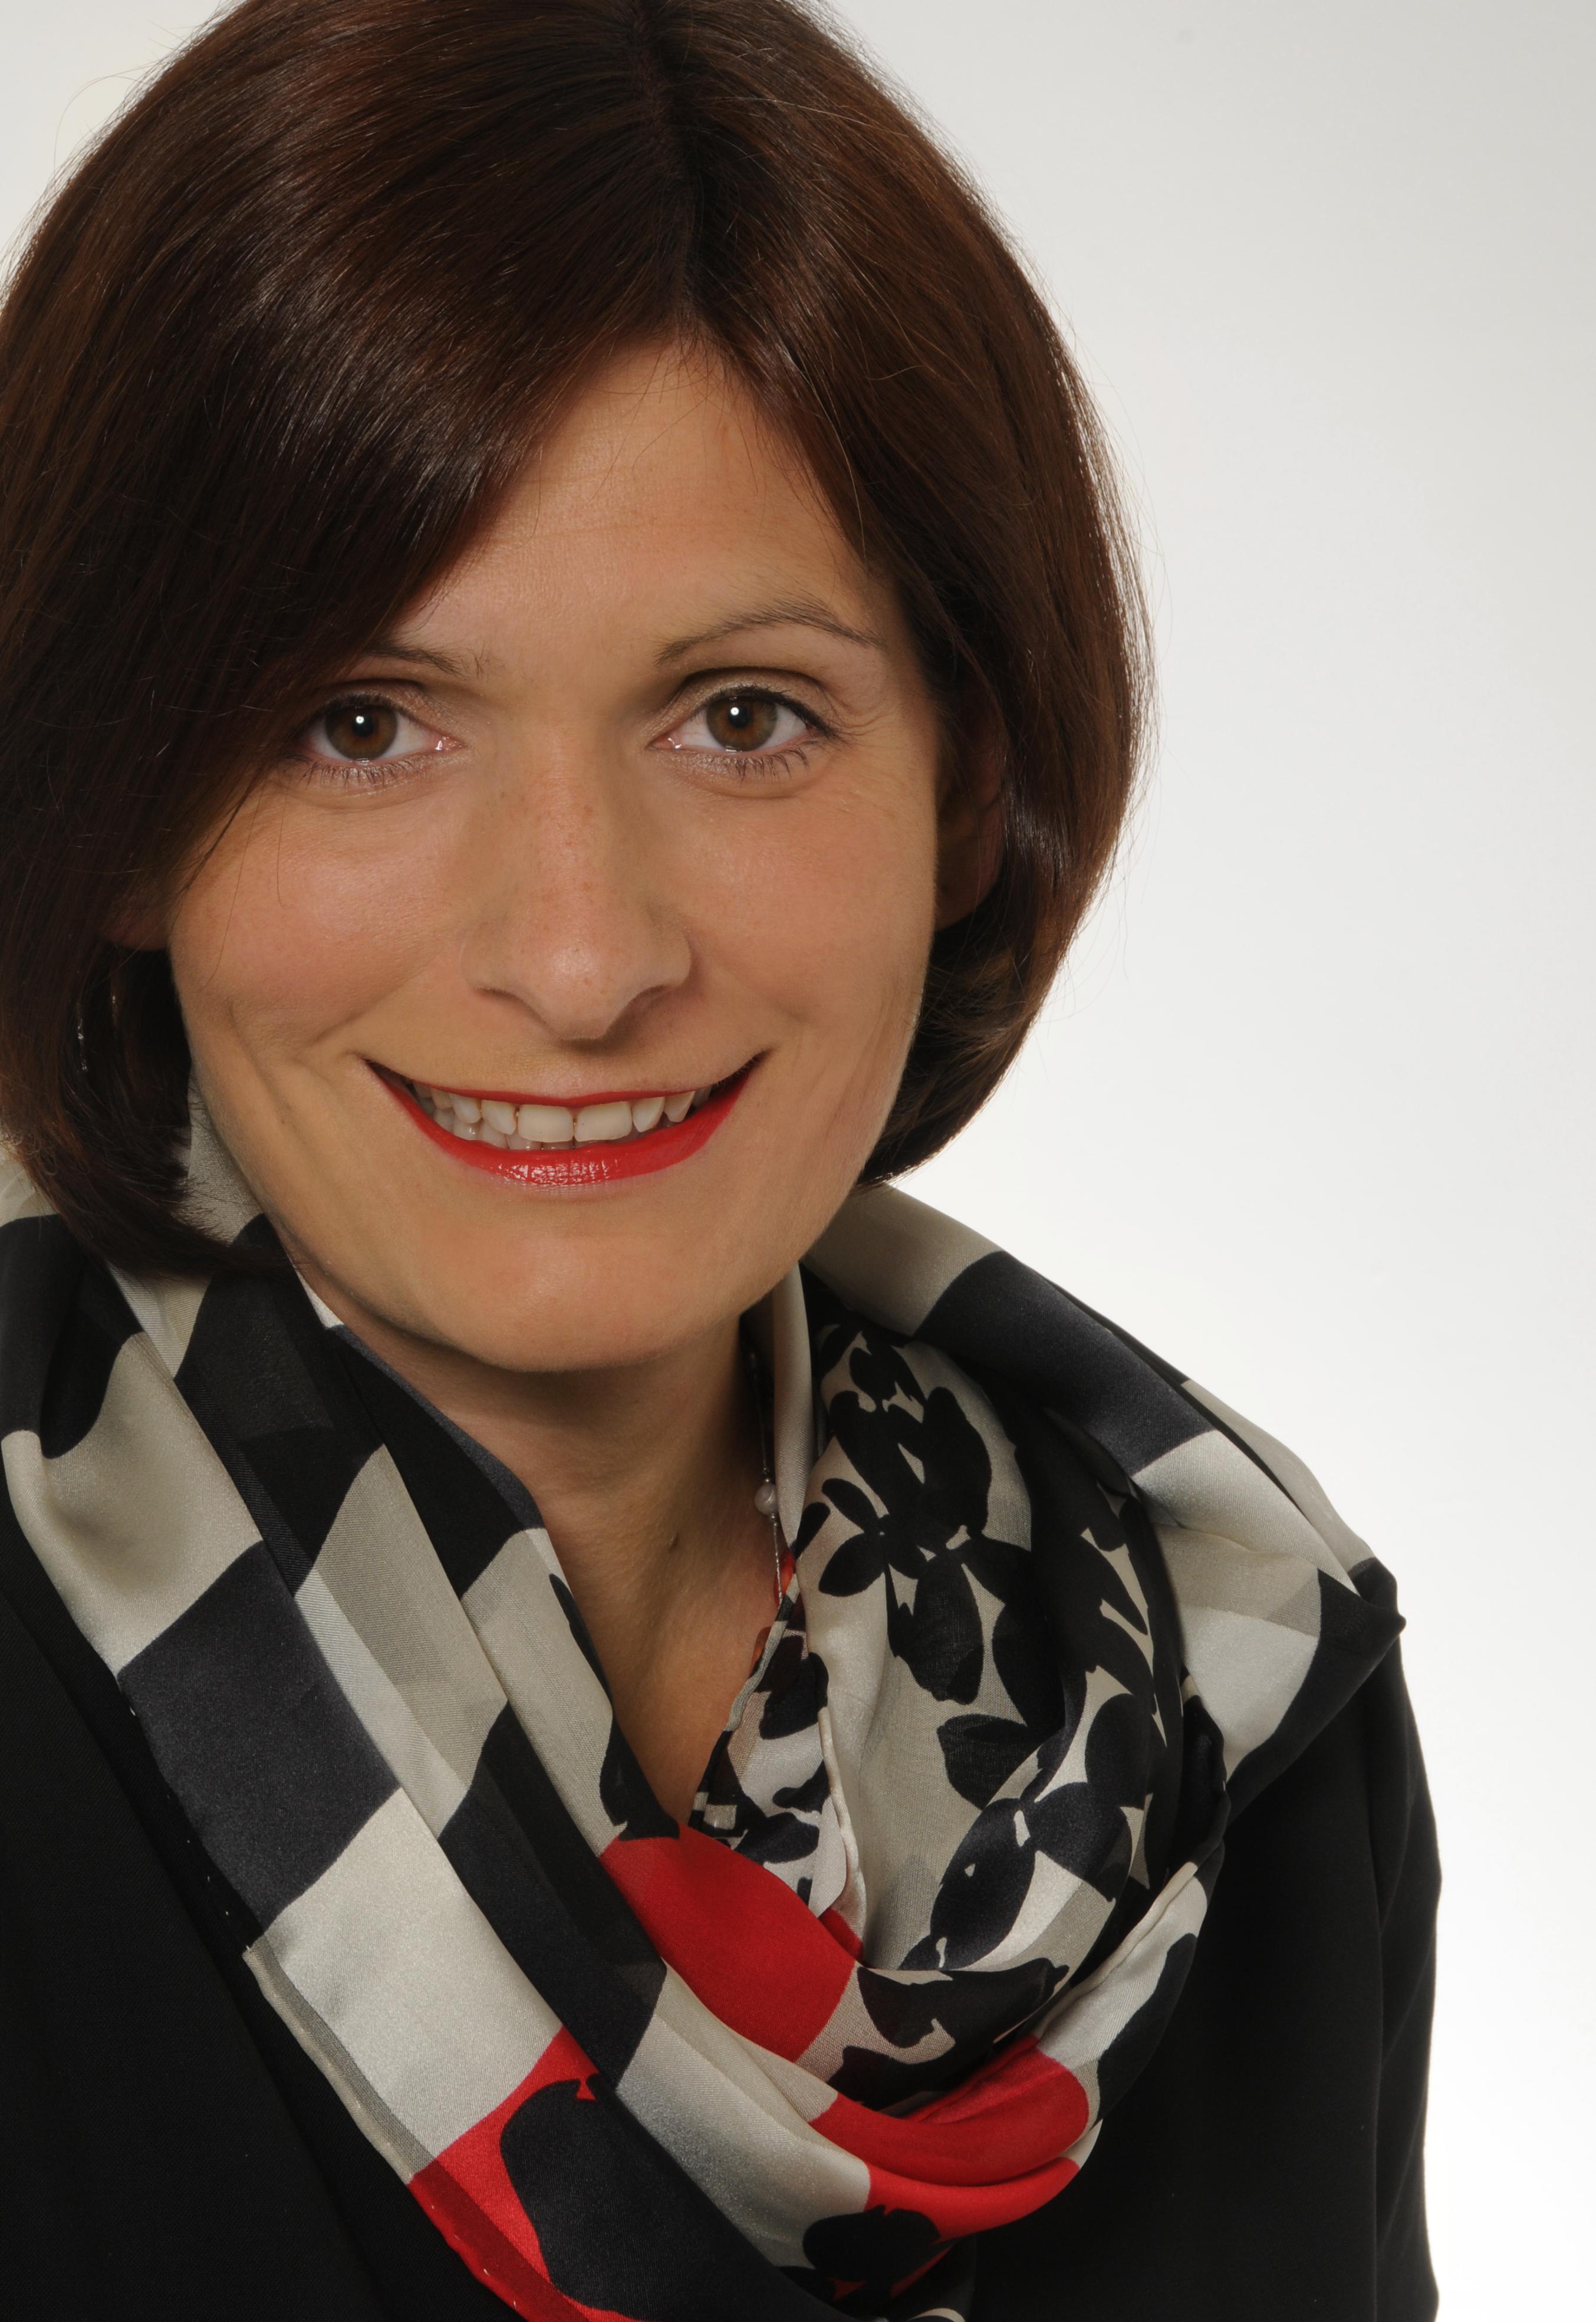 Cornelia Dietrich